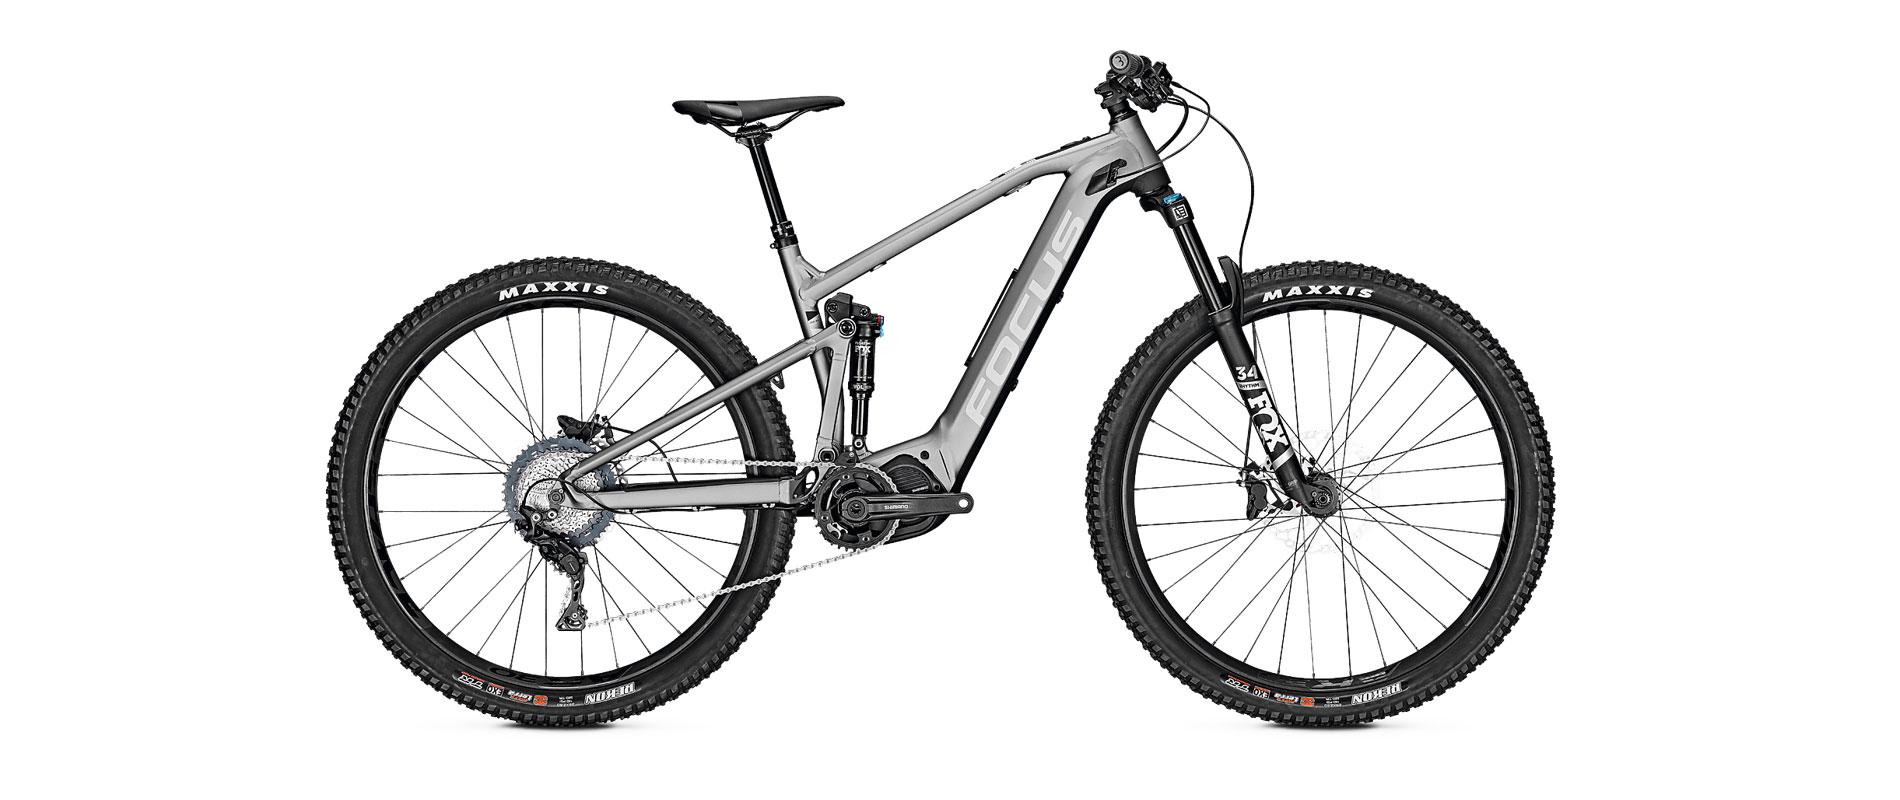 https://bikepointtenerife.com/wp-content/uploads/2019/05/JAM2-5.8-NINE-2-main-image.jpg